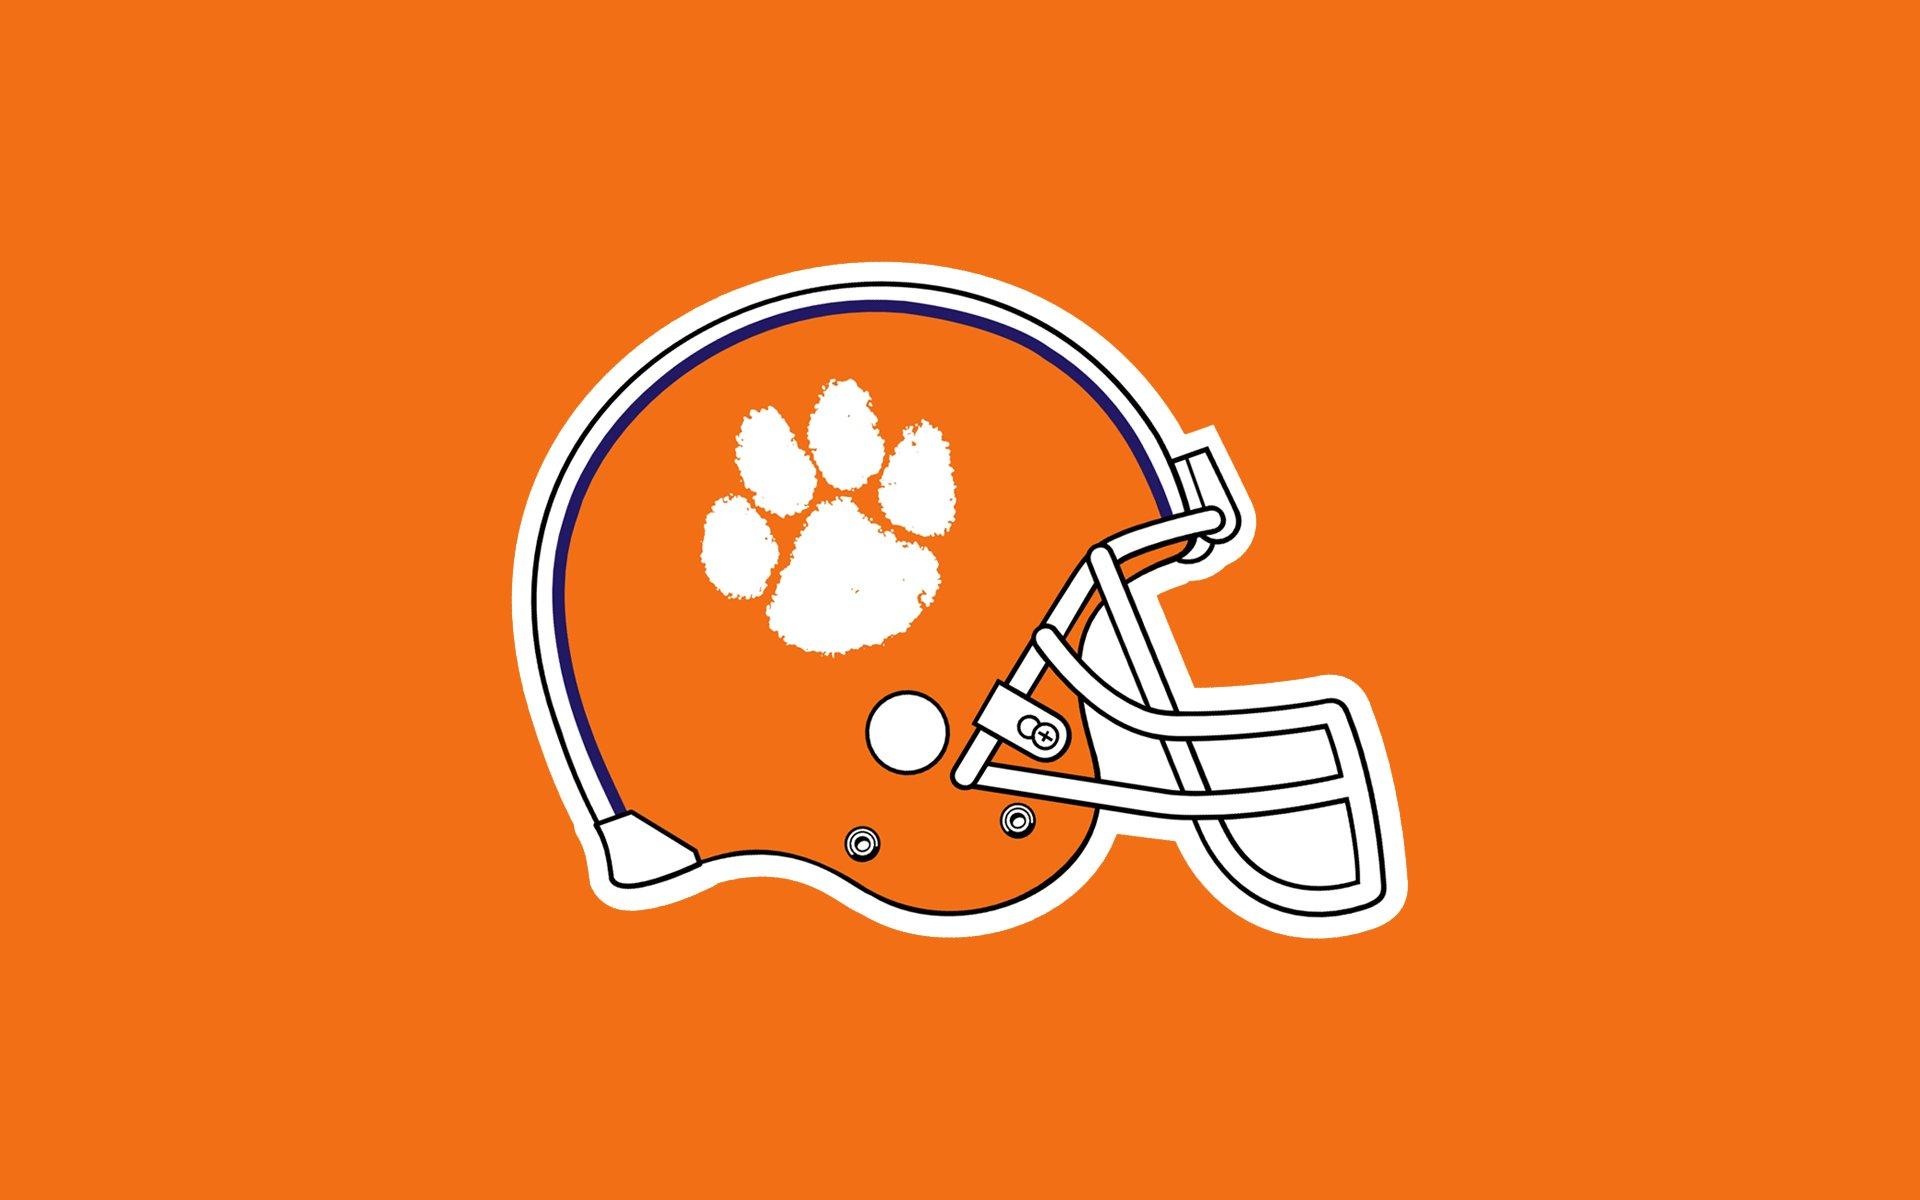 CLEMSON TIGERS college football wallpaper 1920x1200 593960 1920x1200